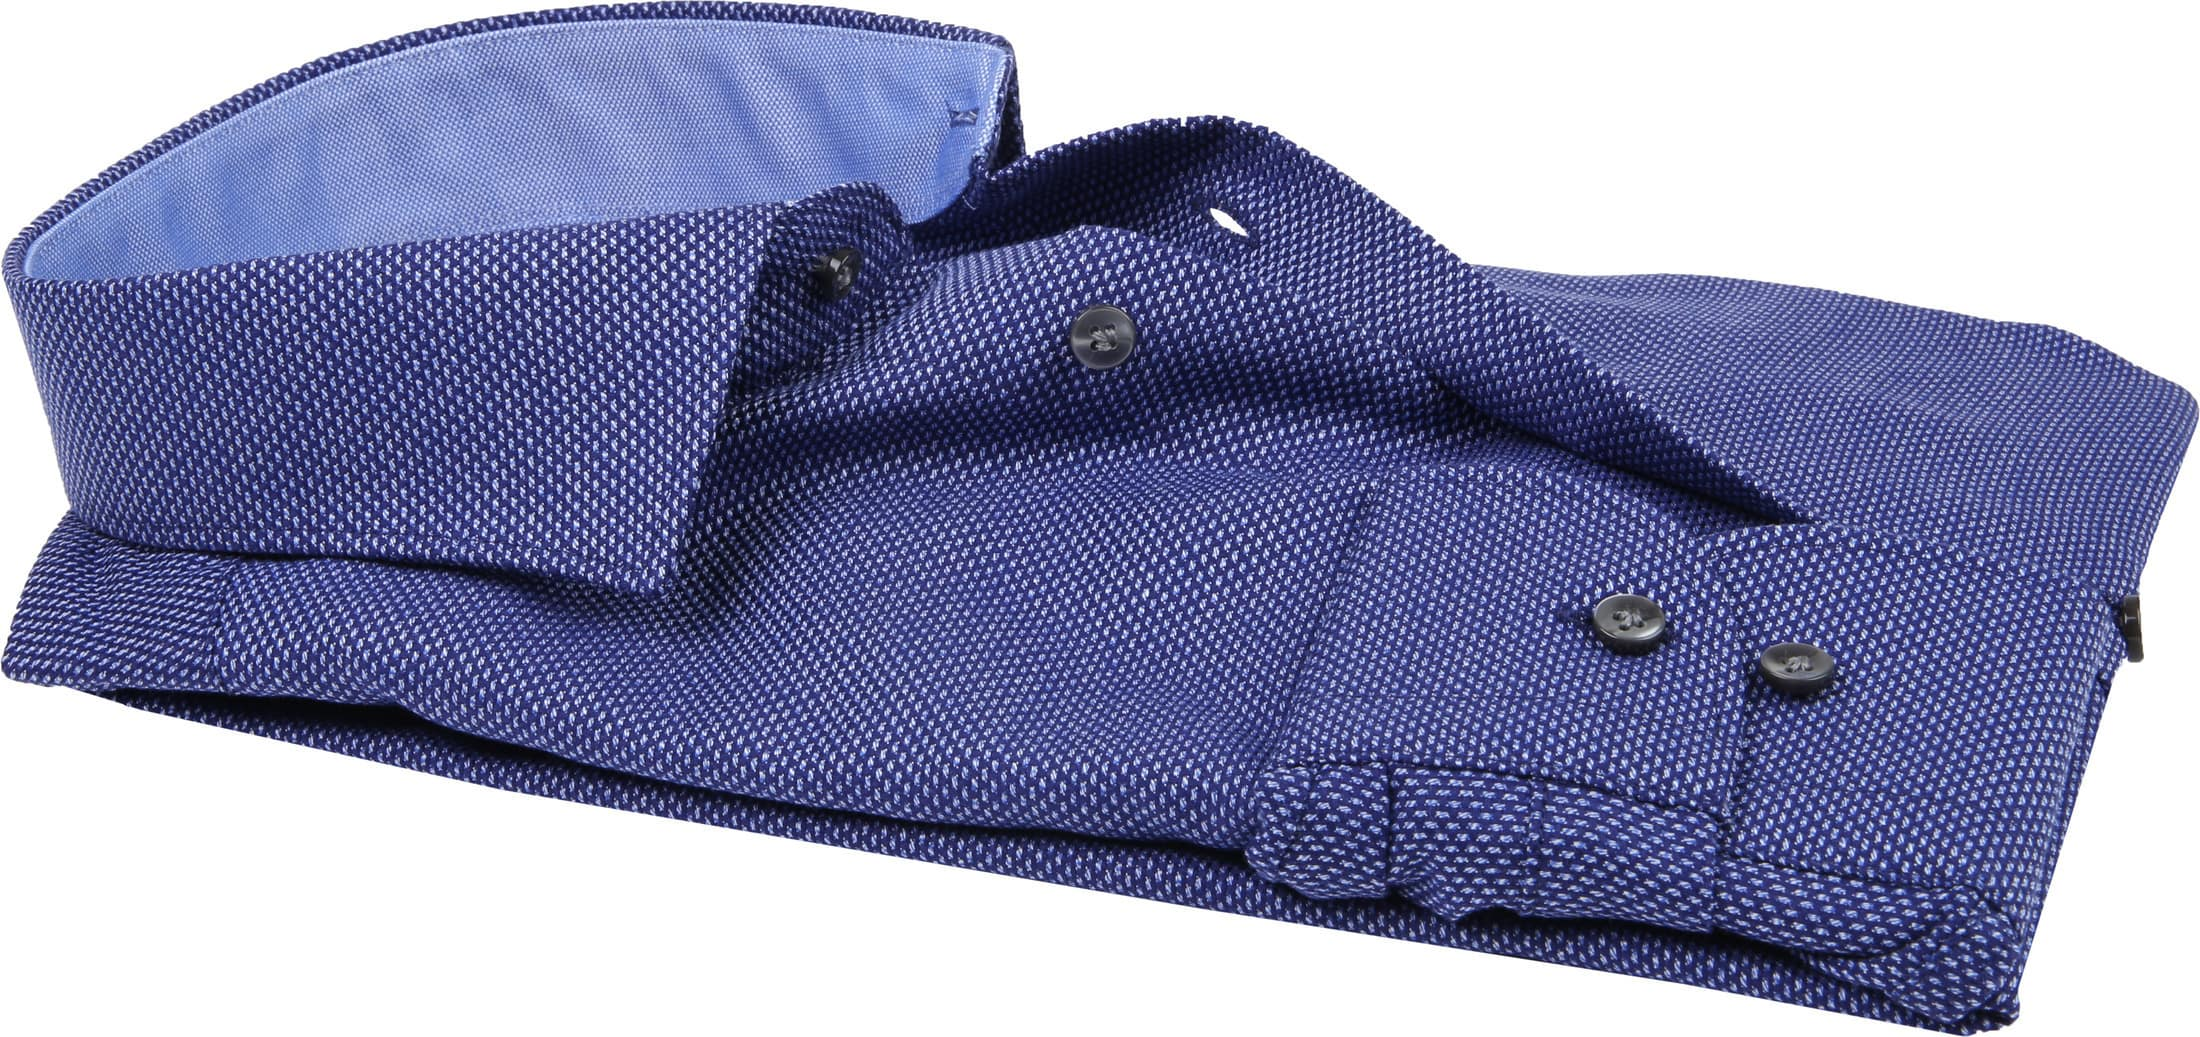 Profuomo Overhemd Oxford Navy Dessin foto 2